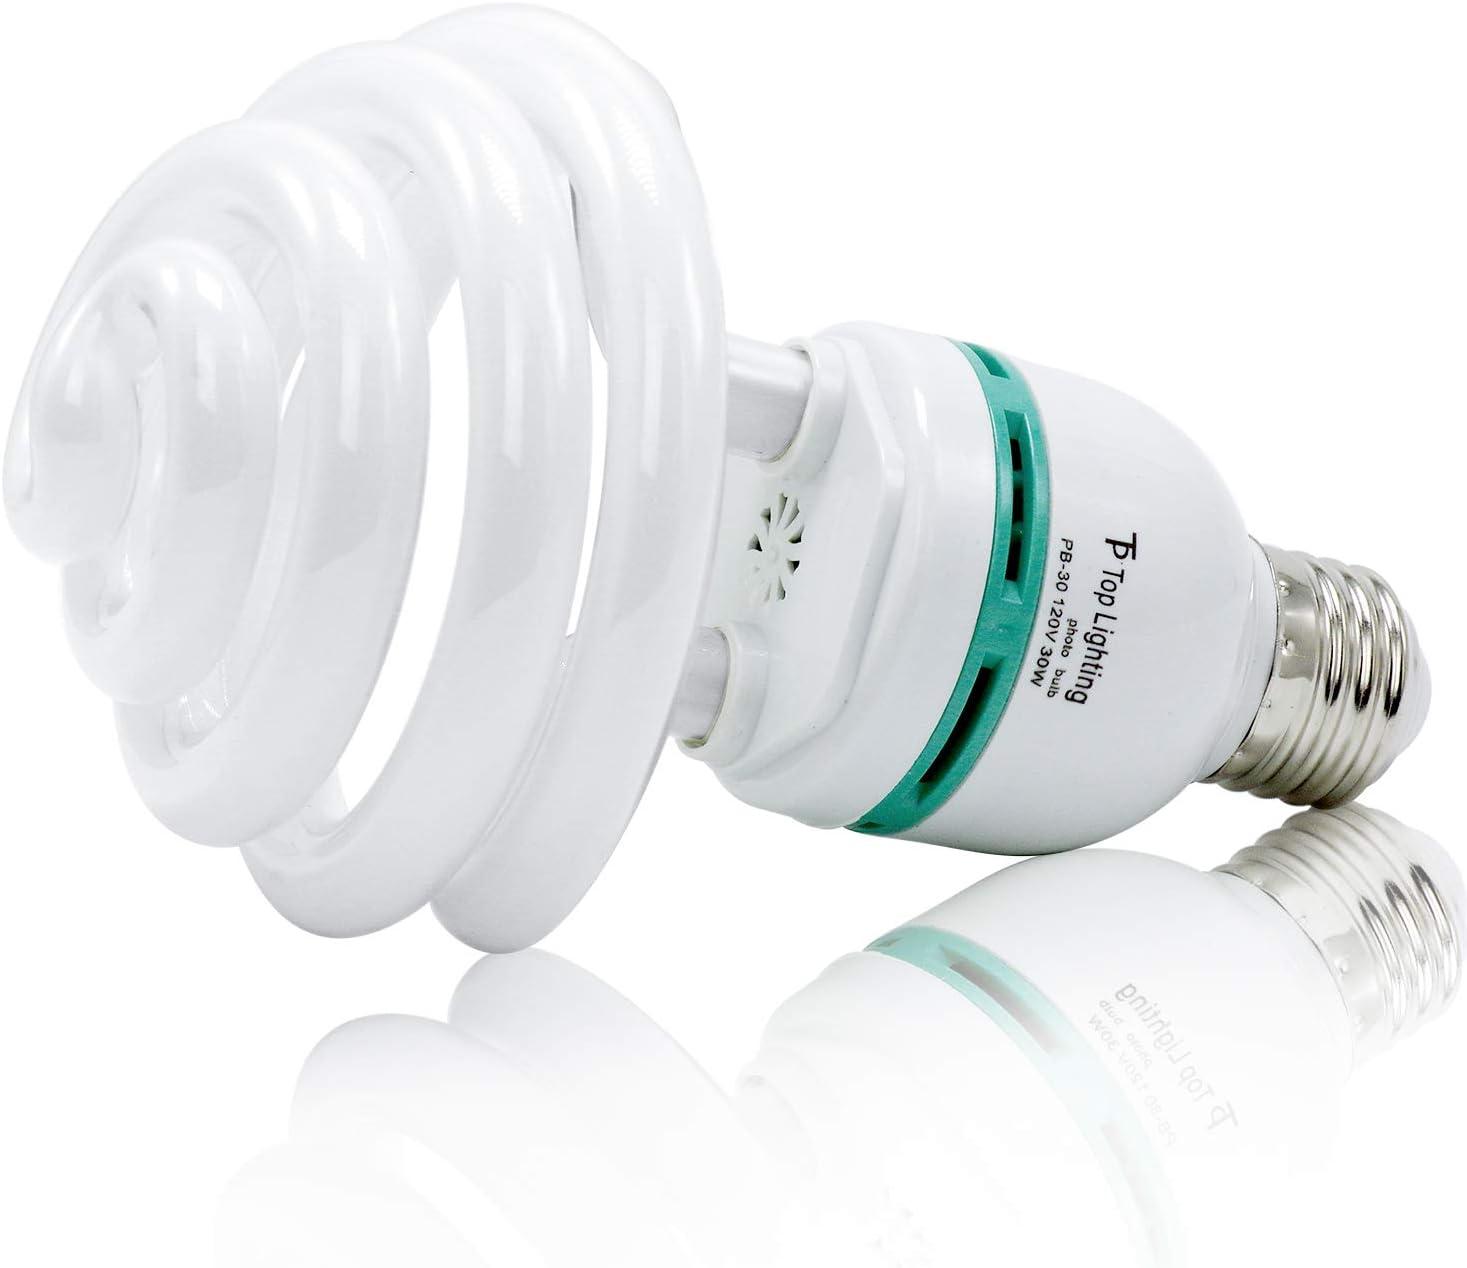 LimoStudio 30 Watt Compact Fluorescent Photography Photo CFL Lighting Light Bulb 5400K AGG1757